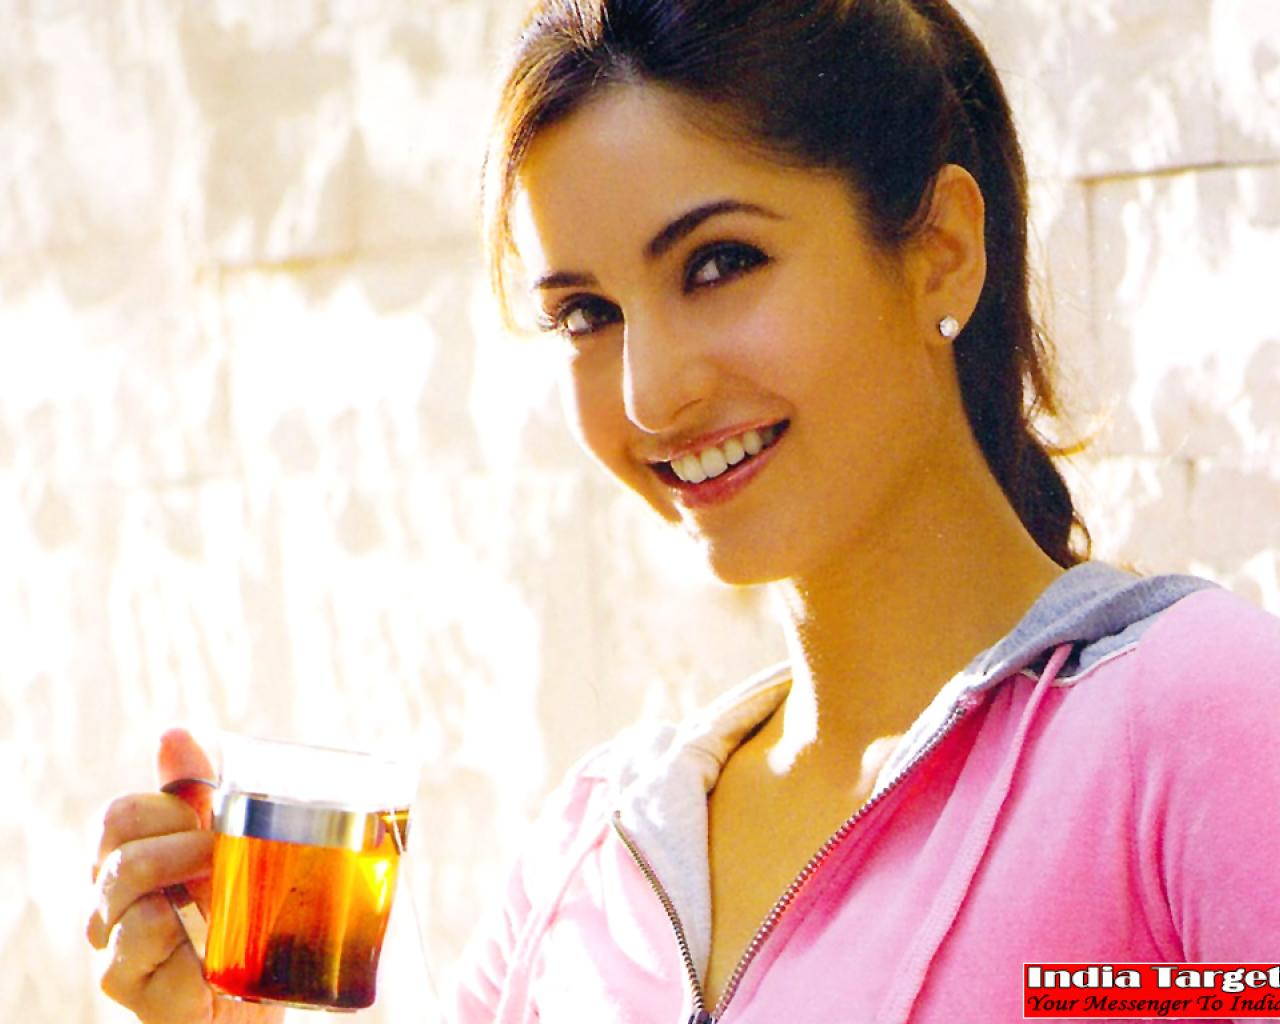 Top Hd Bollywood Wallapers katrina kaif Cute Wallpaper 1280x1024